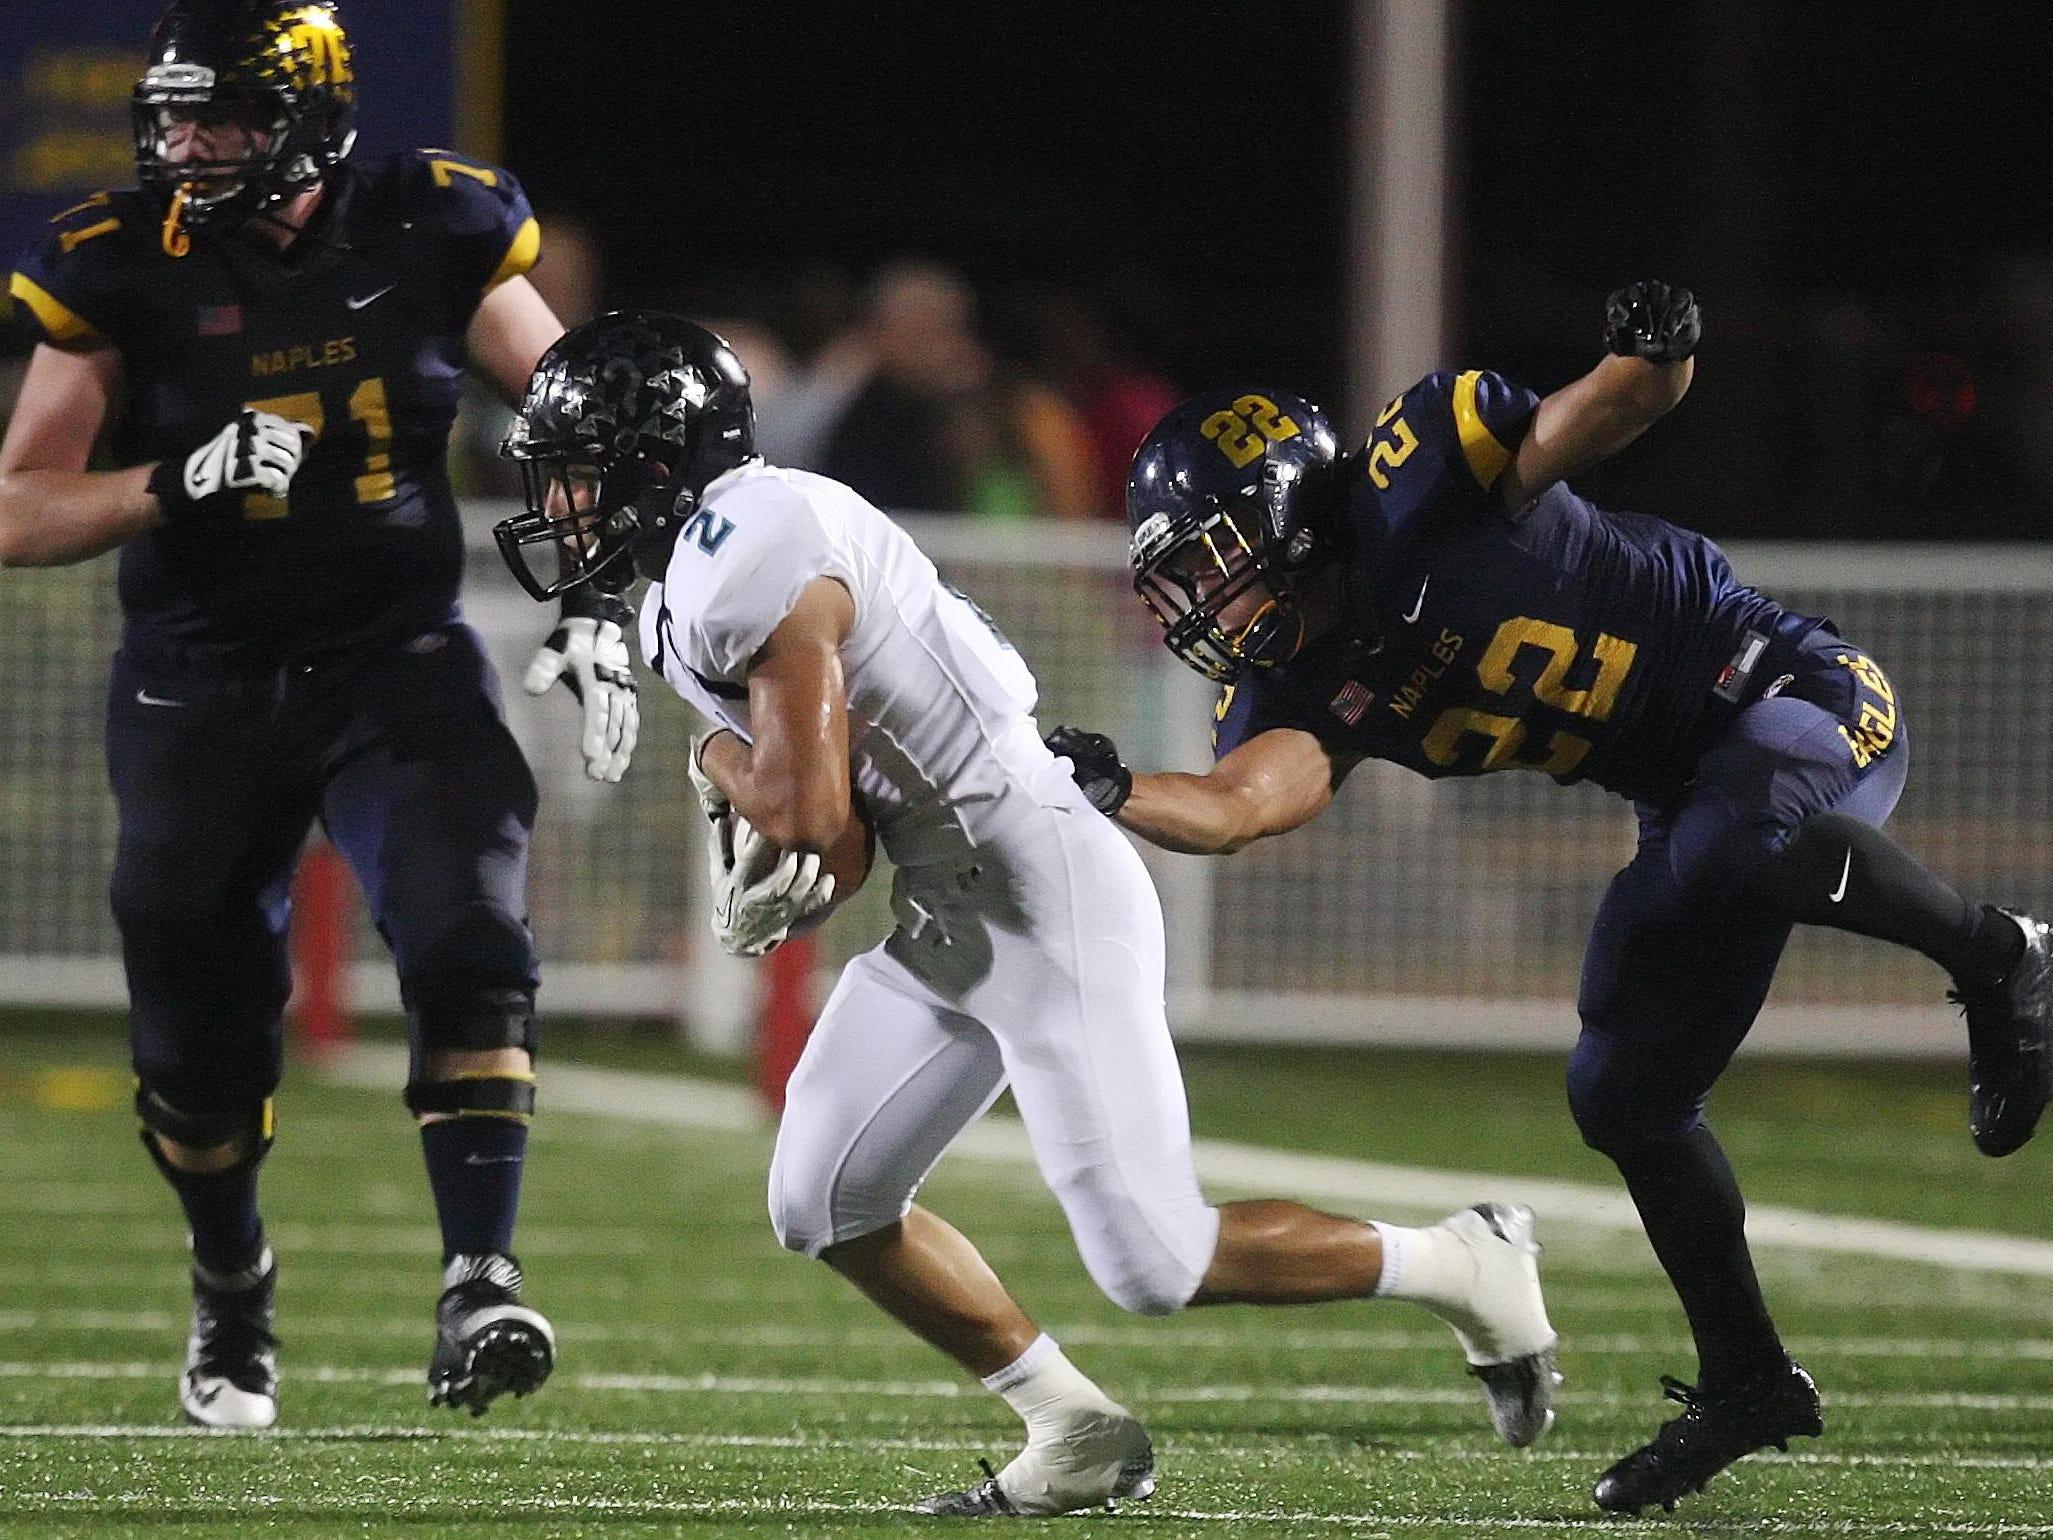 Gulf Coast High School's Vinny Deluca, center, intercepts a pass against Naples on Friday at Naples High School.